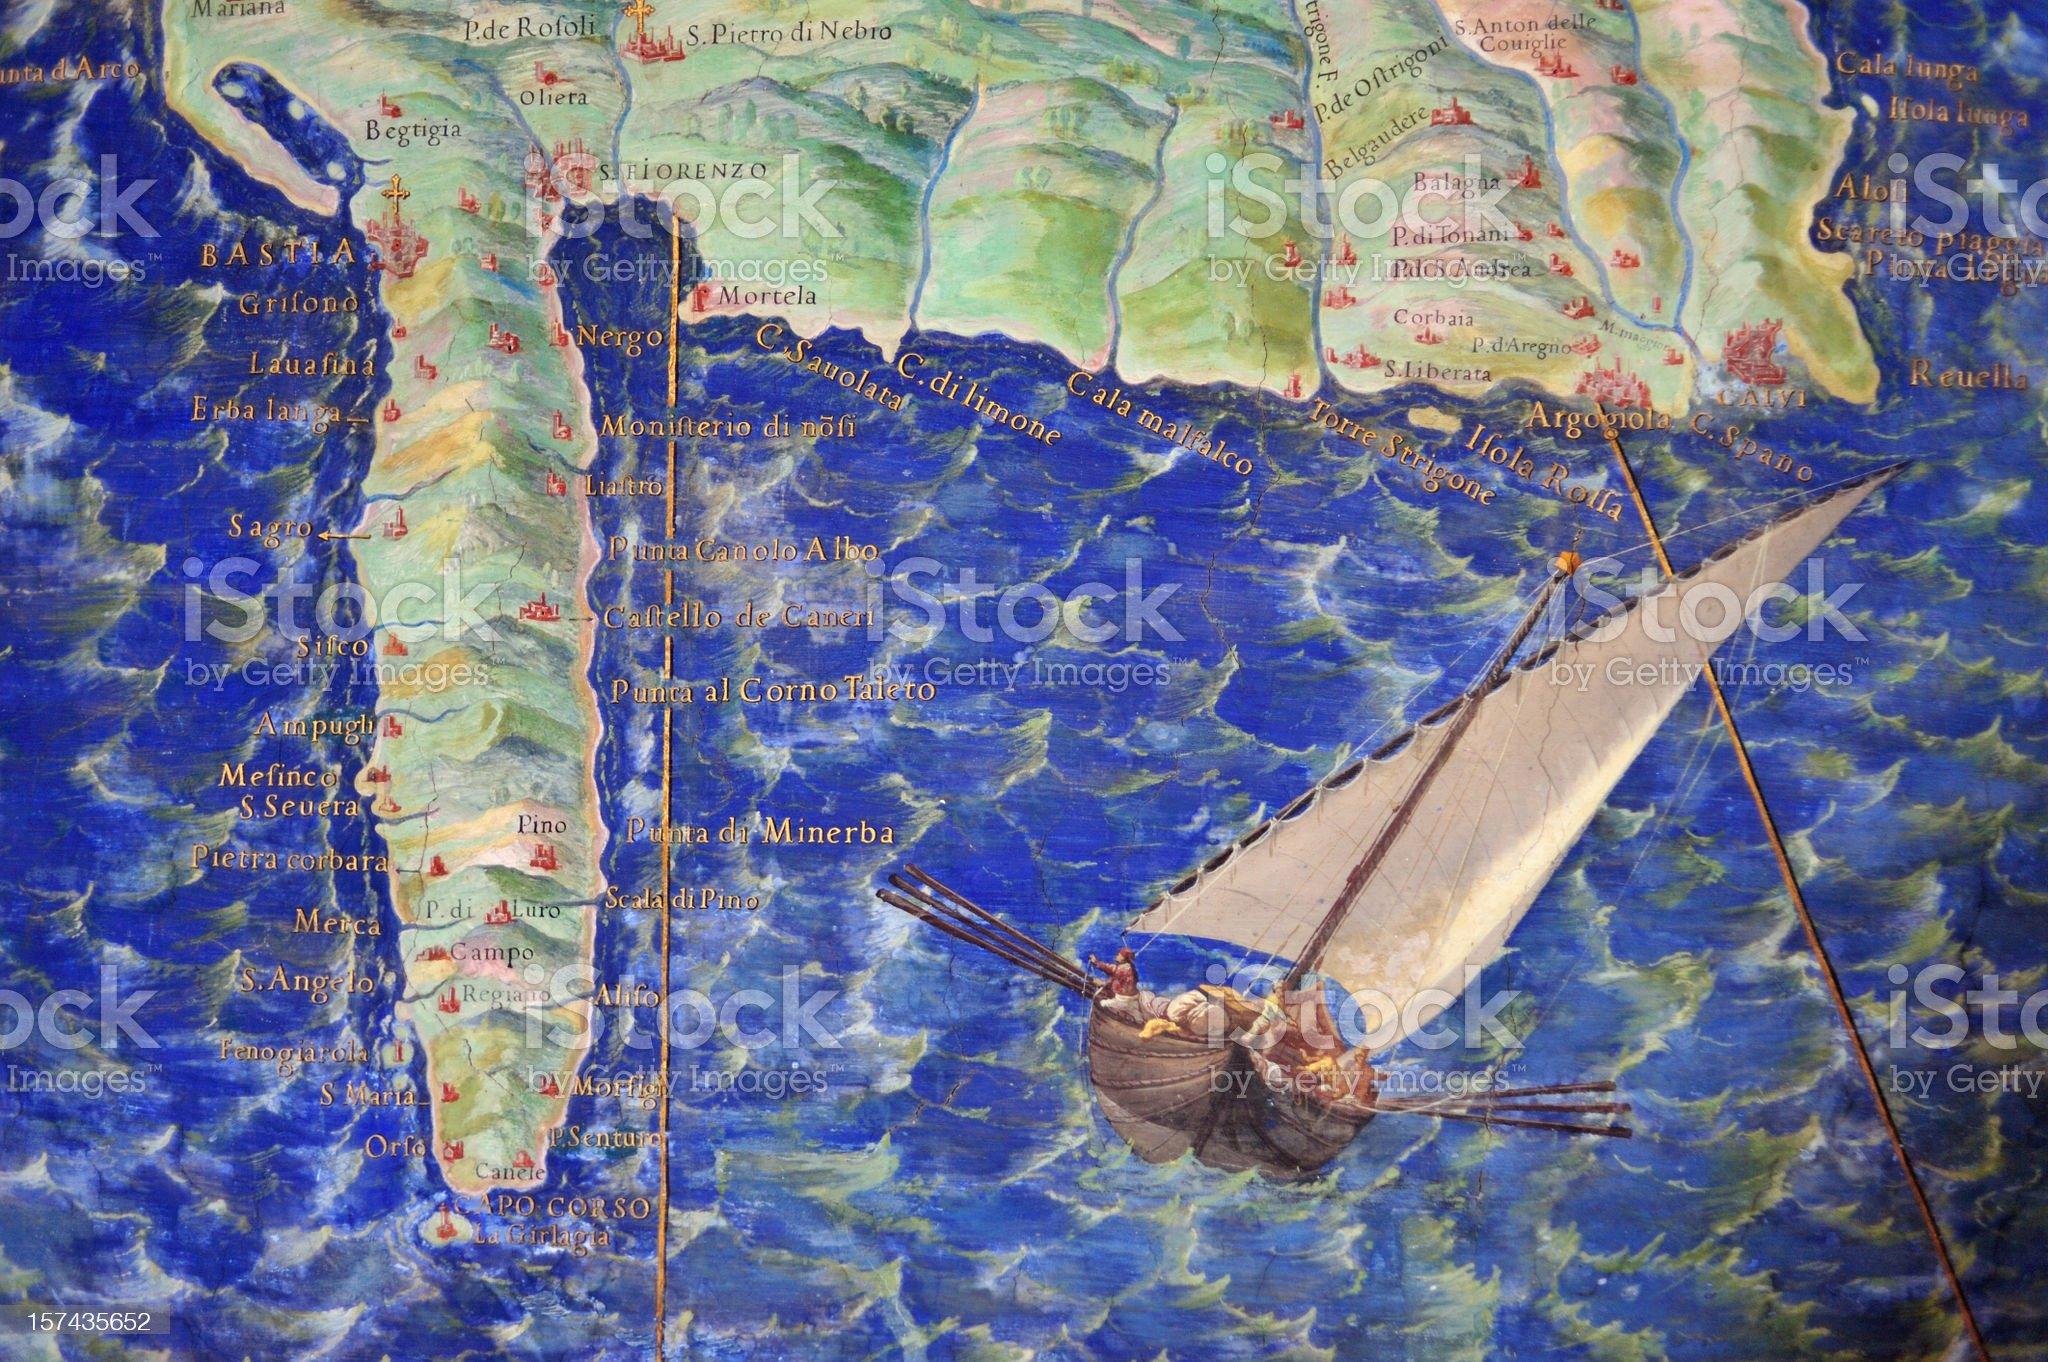 Old map illustration royalty-free stock photo